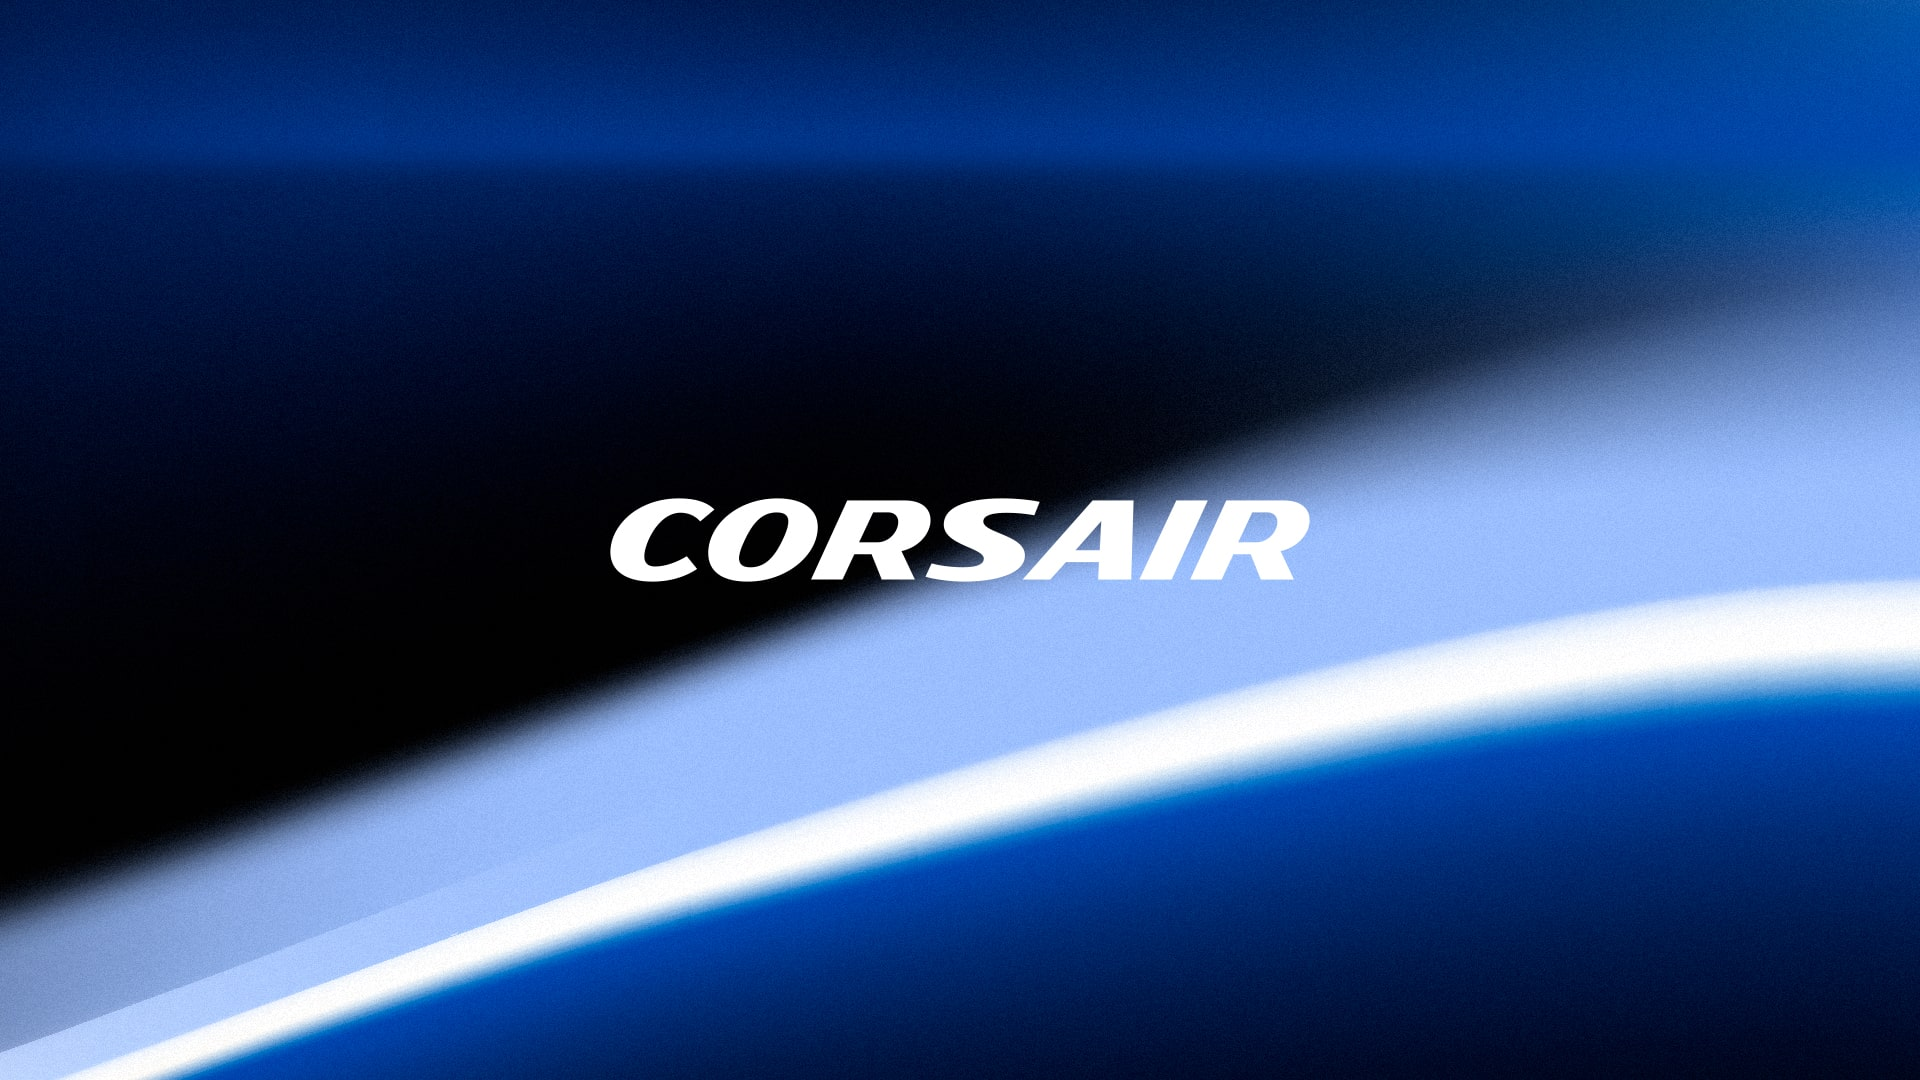 CORSAIR_Works-min